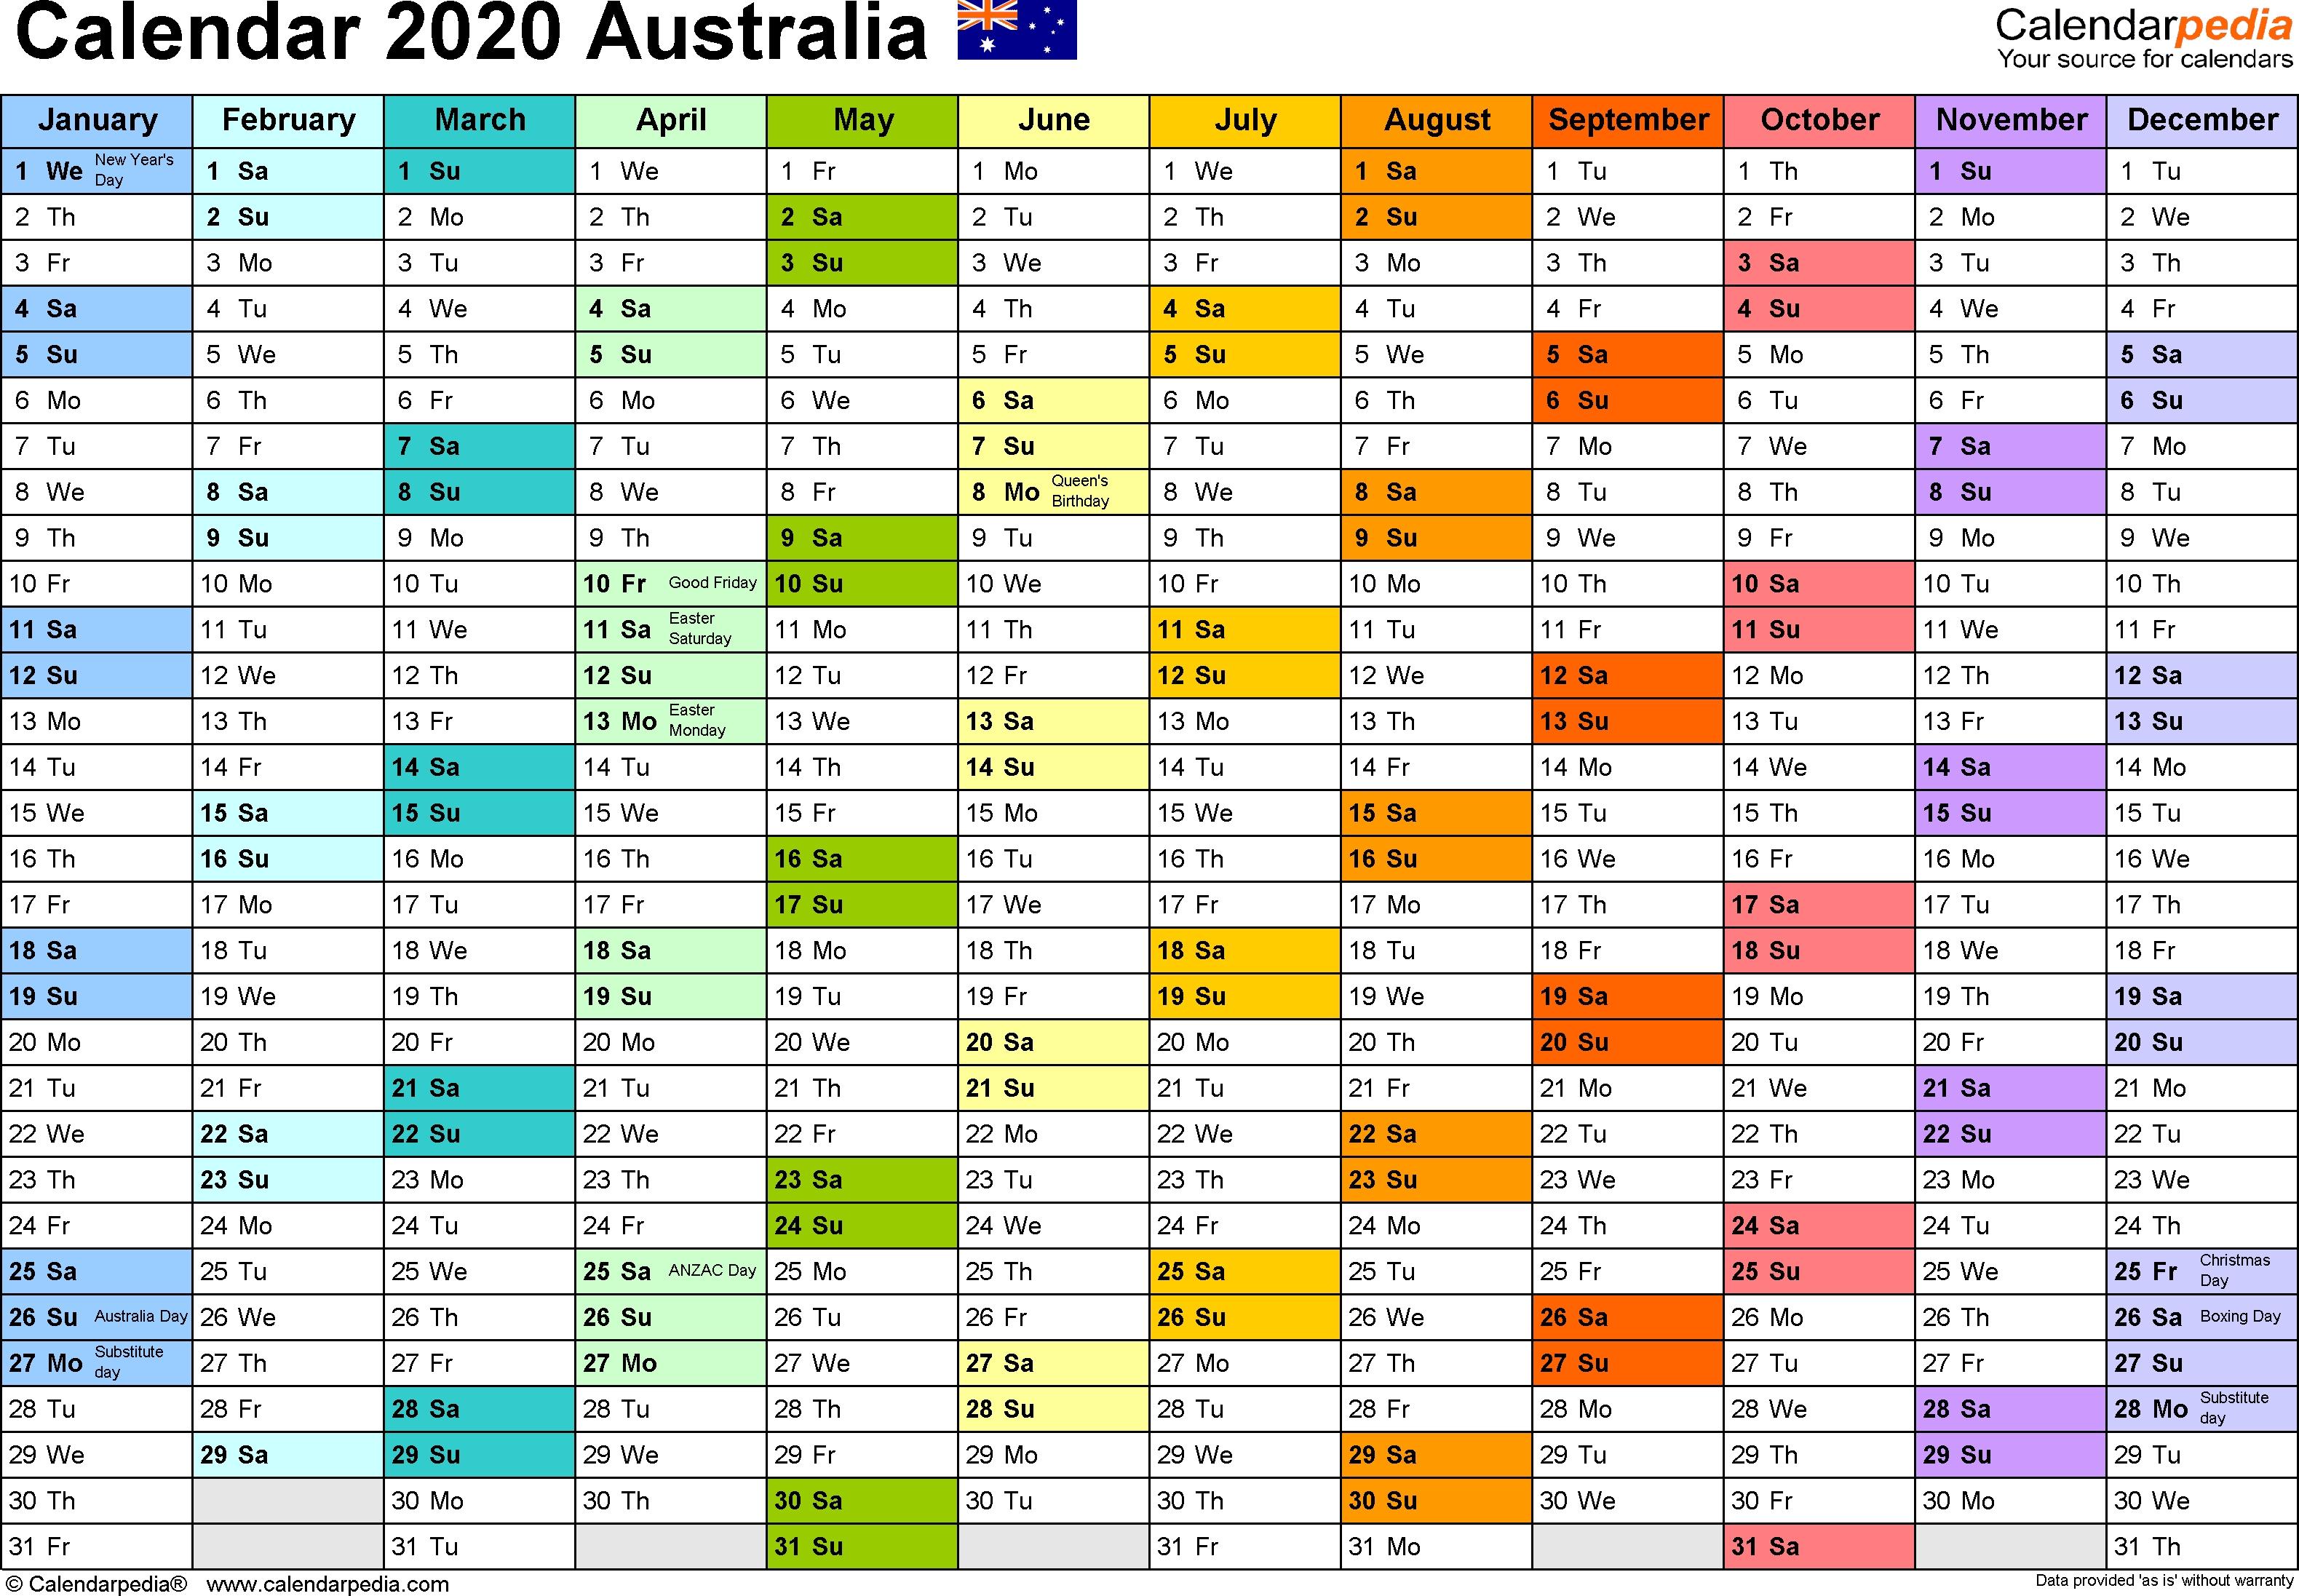 Australia Calendar 2020 - Free Printable Excel Templates  Australian Financial Year Calendar 2020 2010